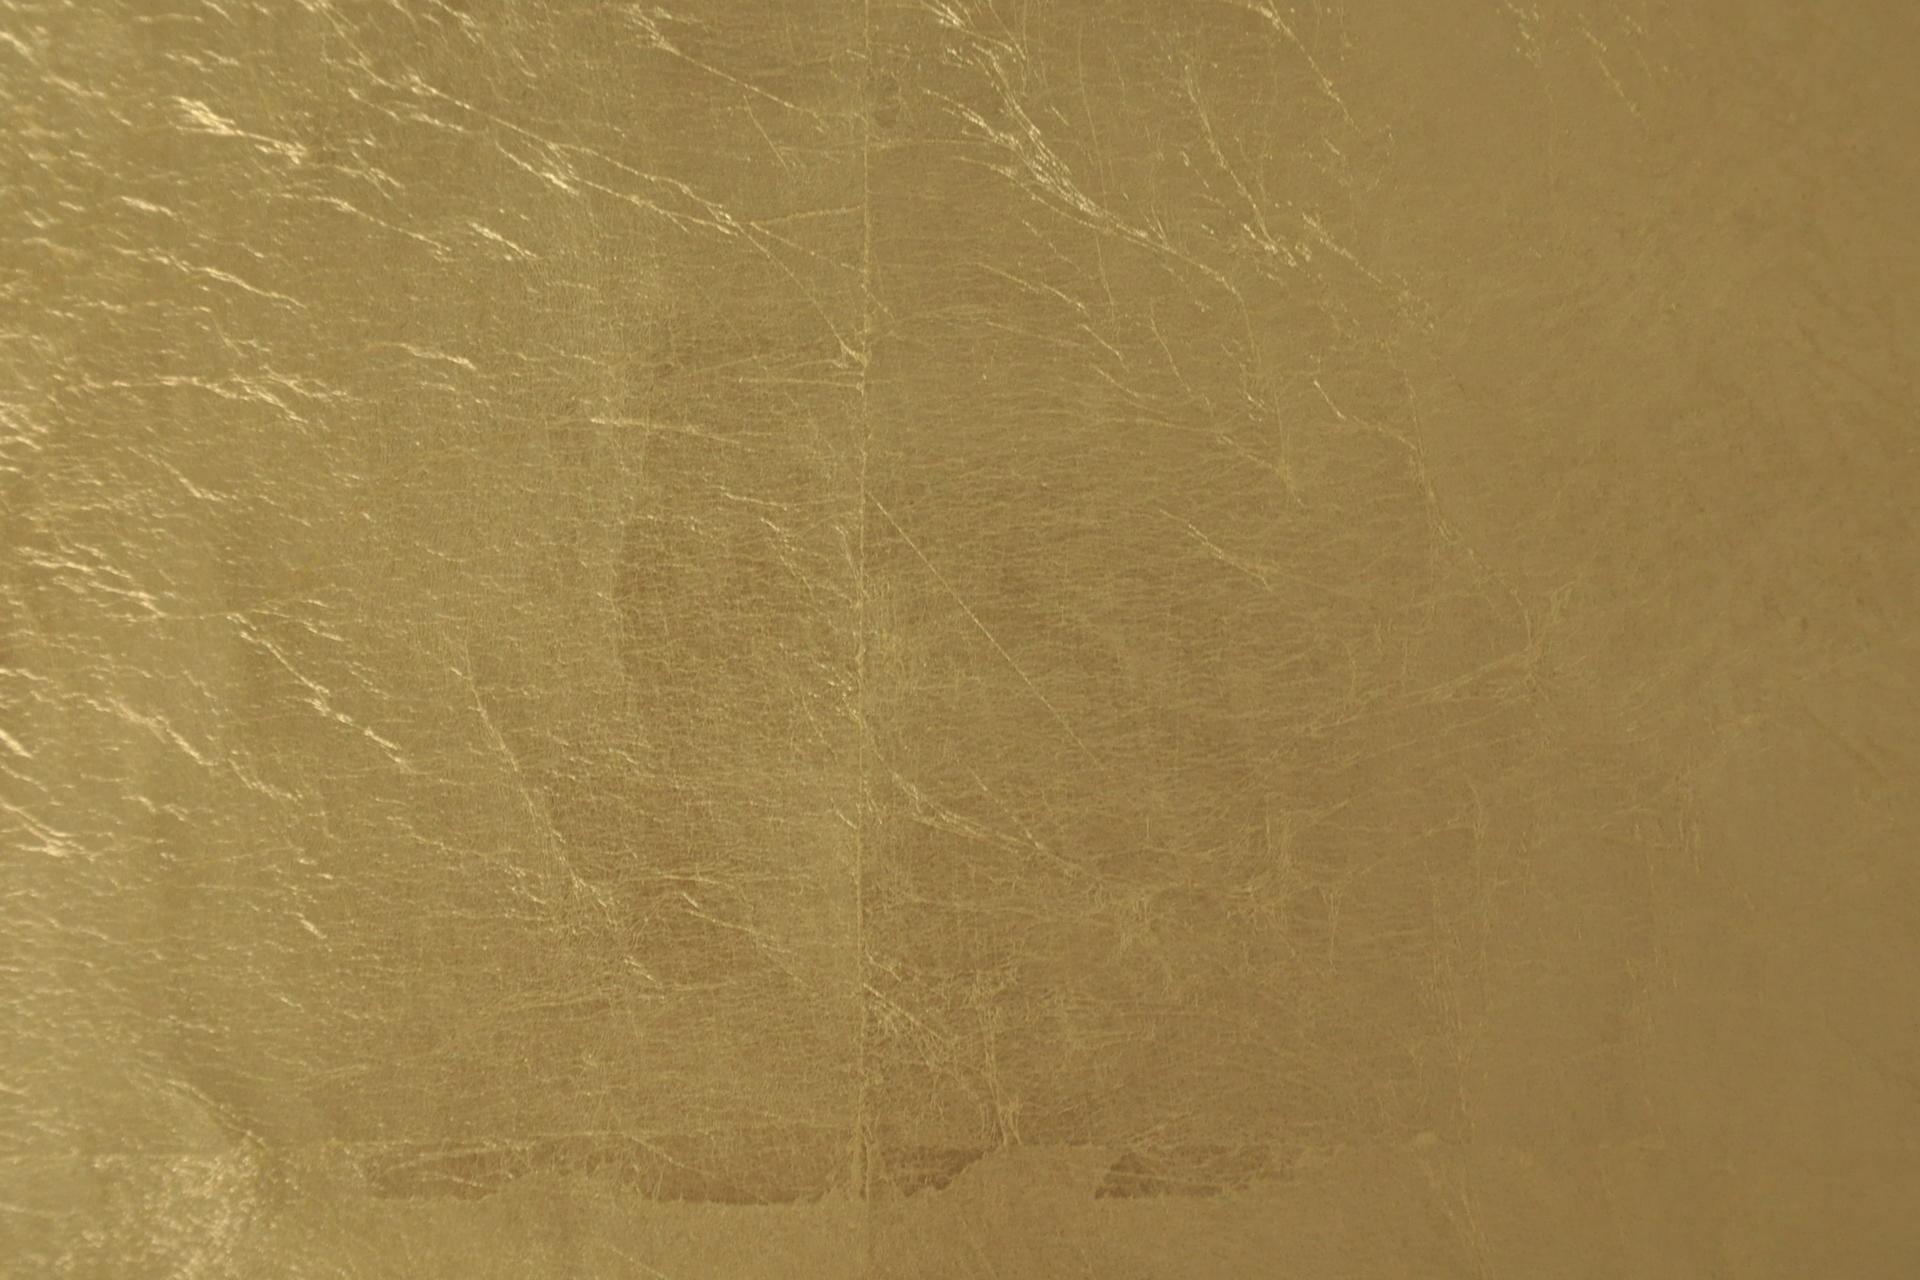 silver leaf wallpaper ml 74 gold leaf wallpaper ml 78